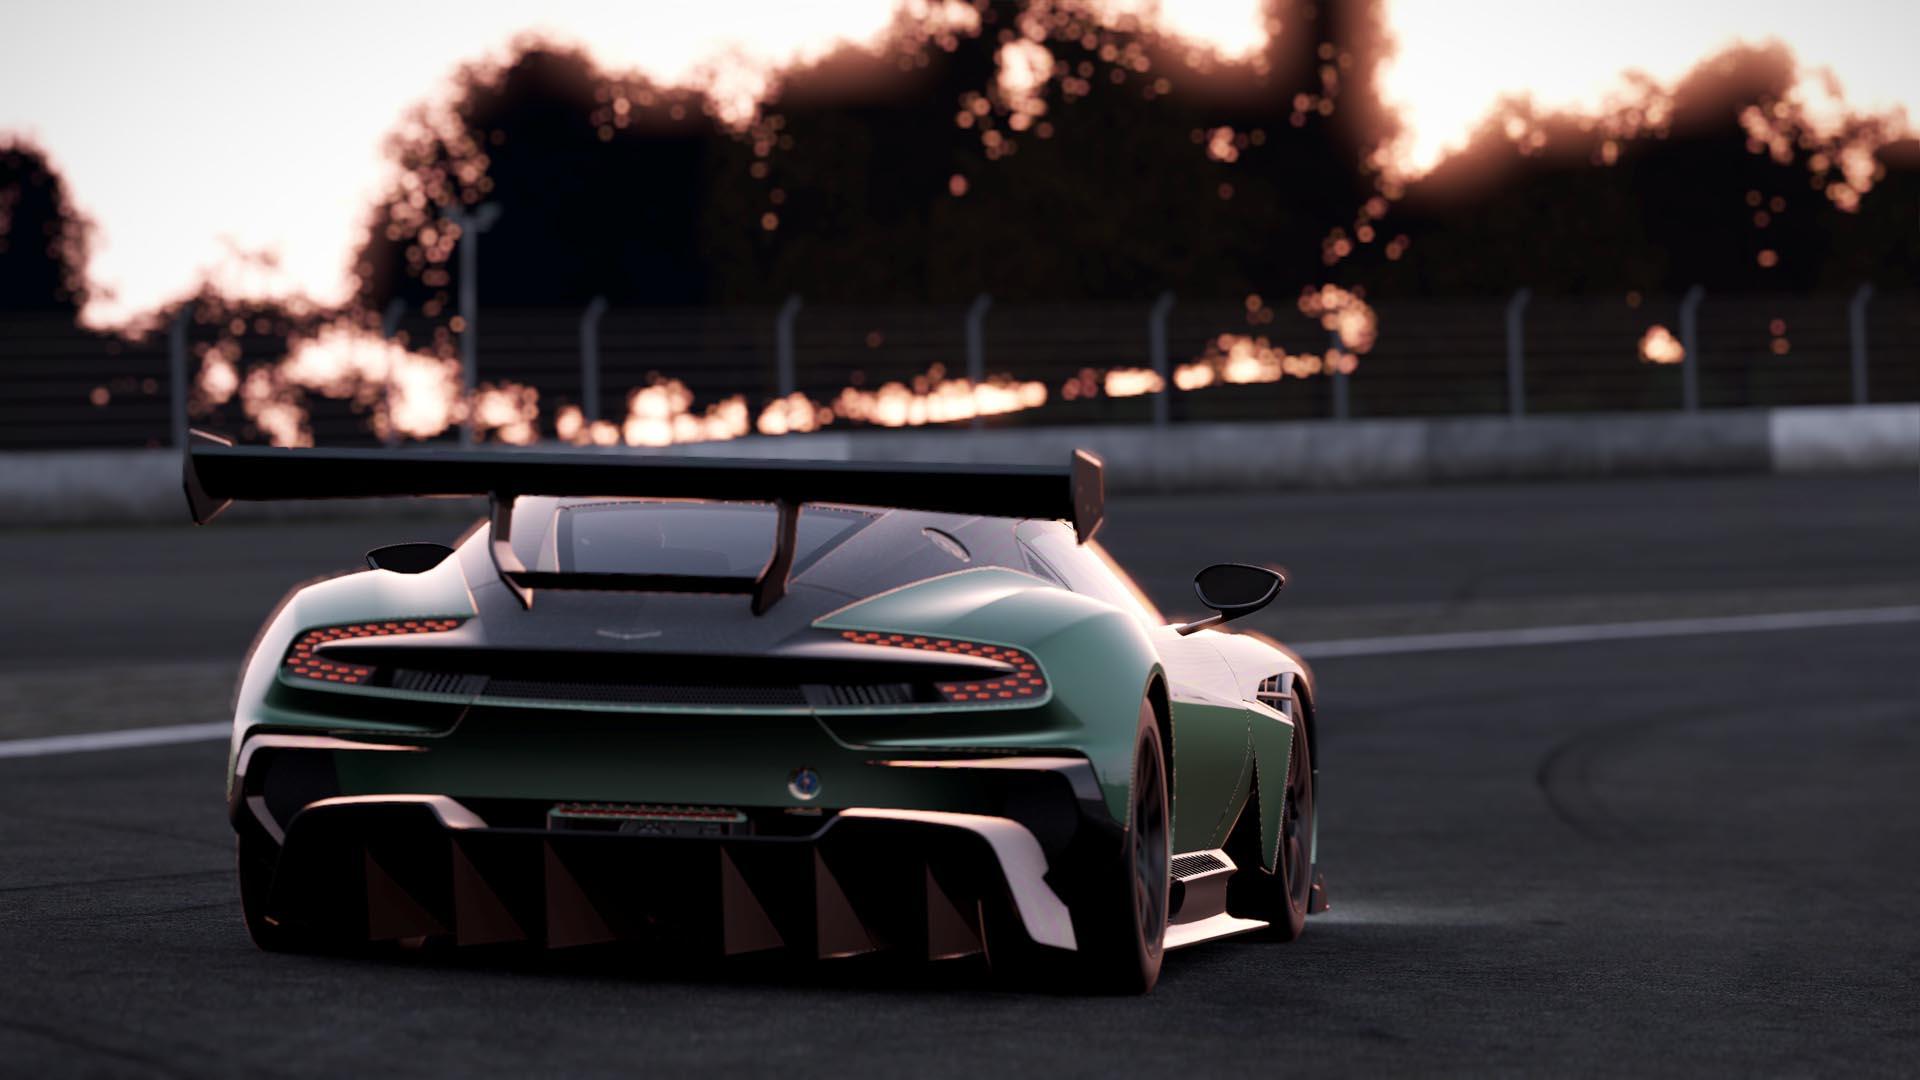 Aston_Martin_Vulcan_-_Fuji_Speedway_1486042516